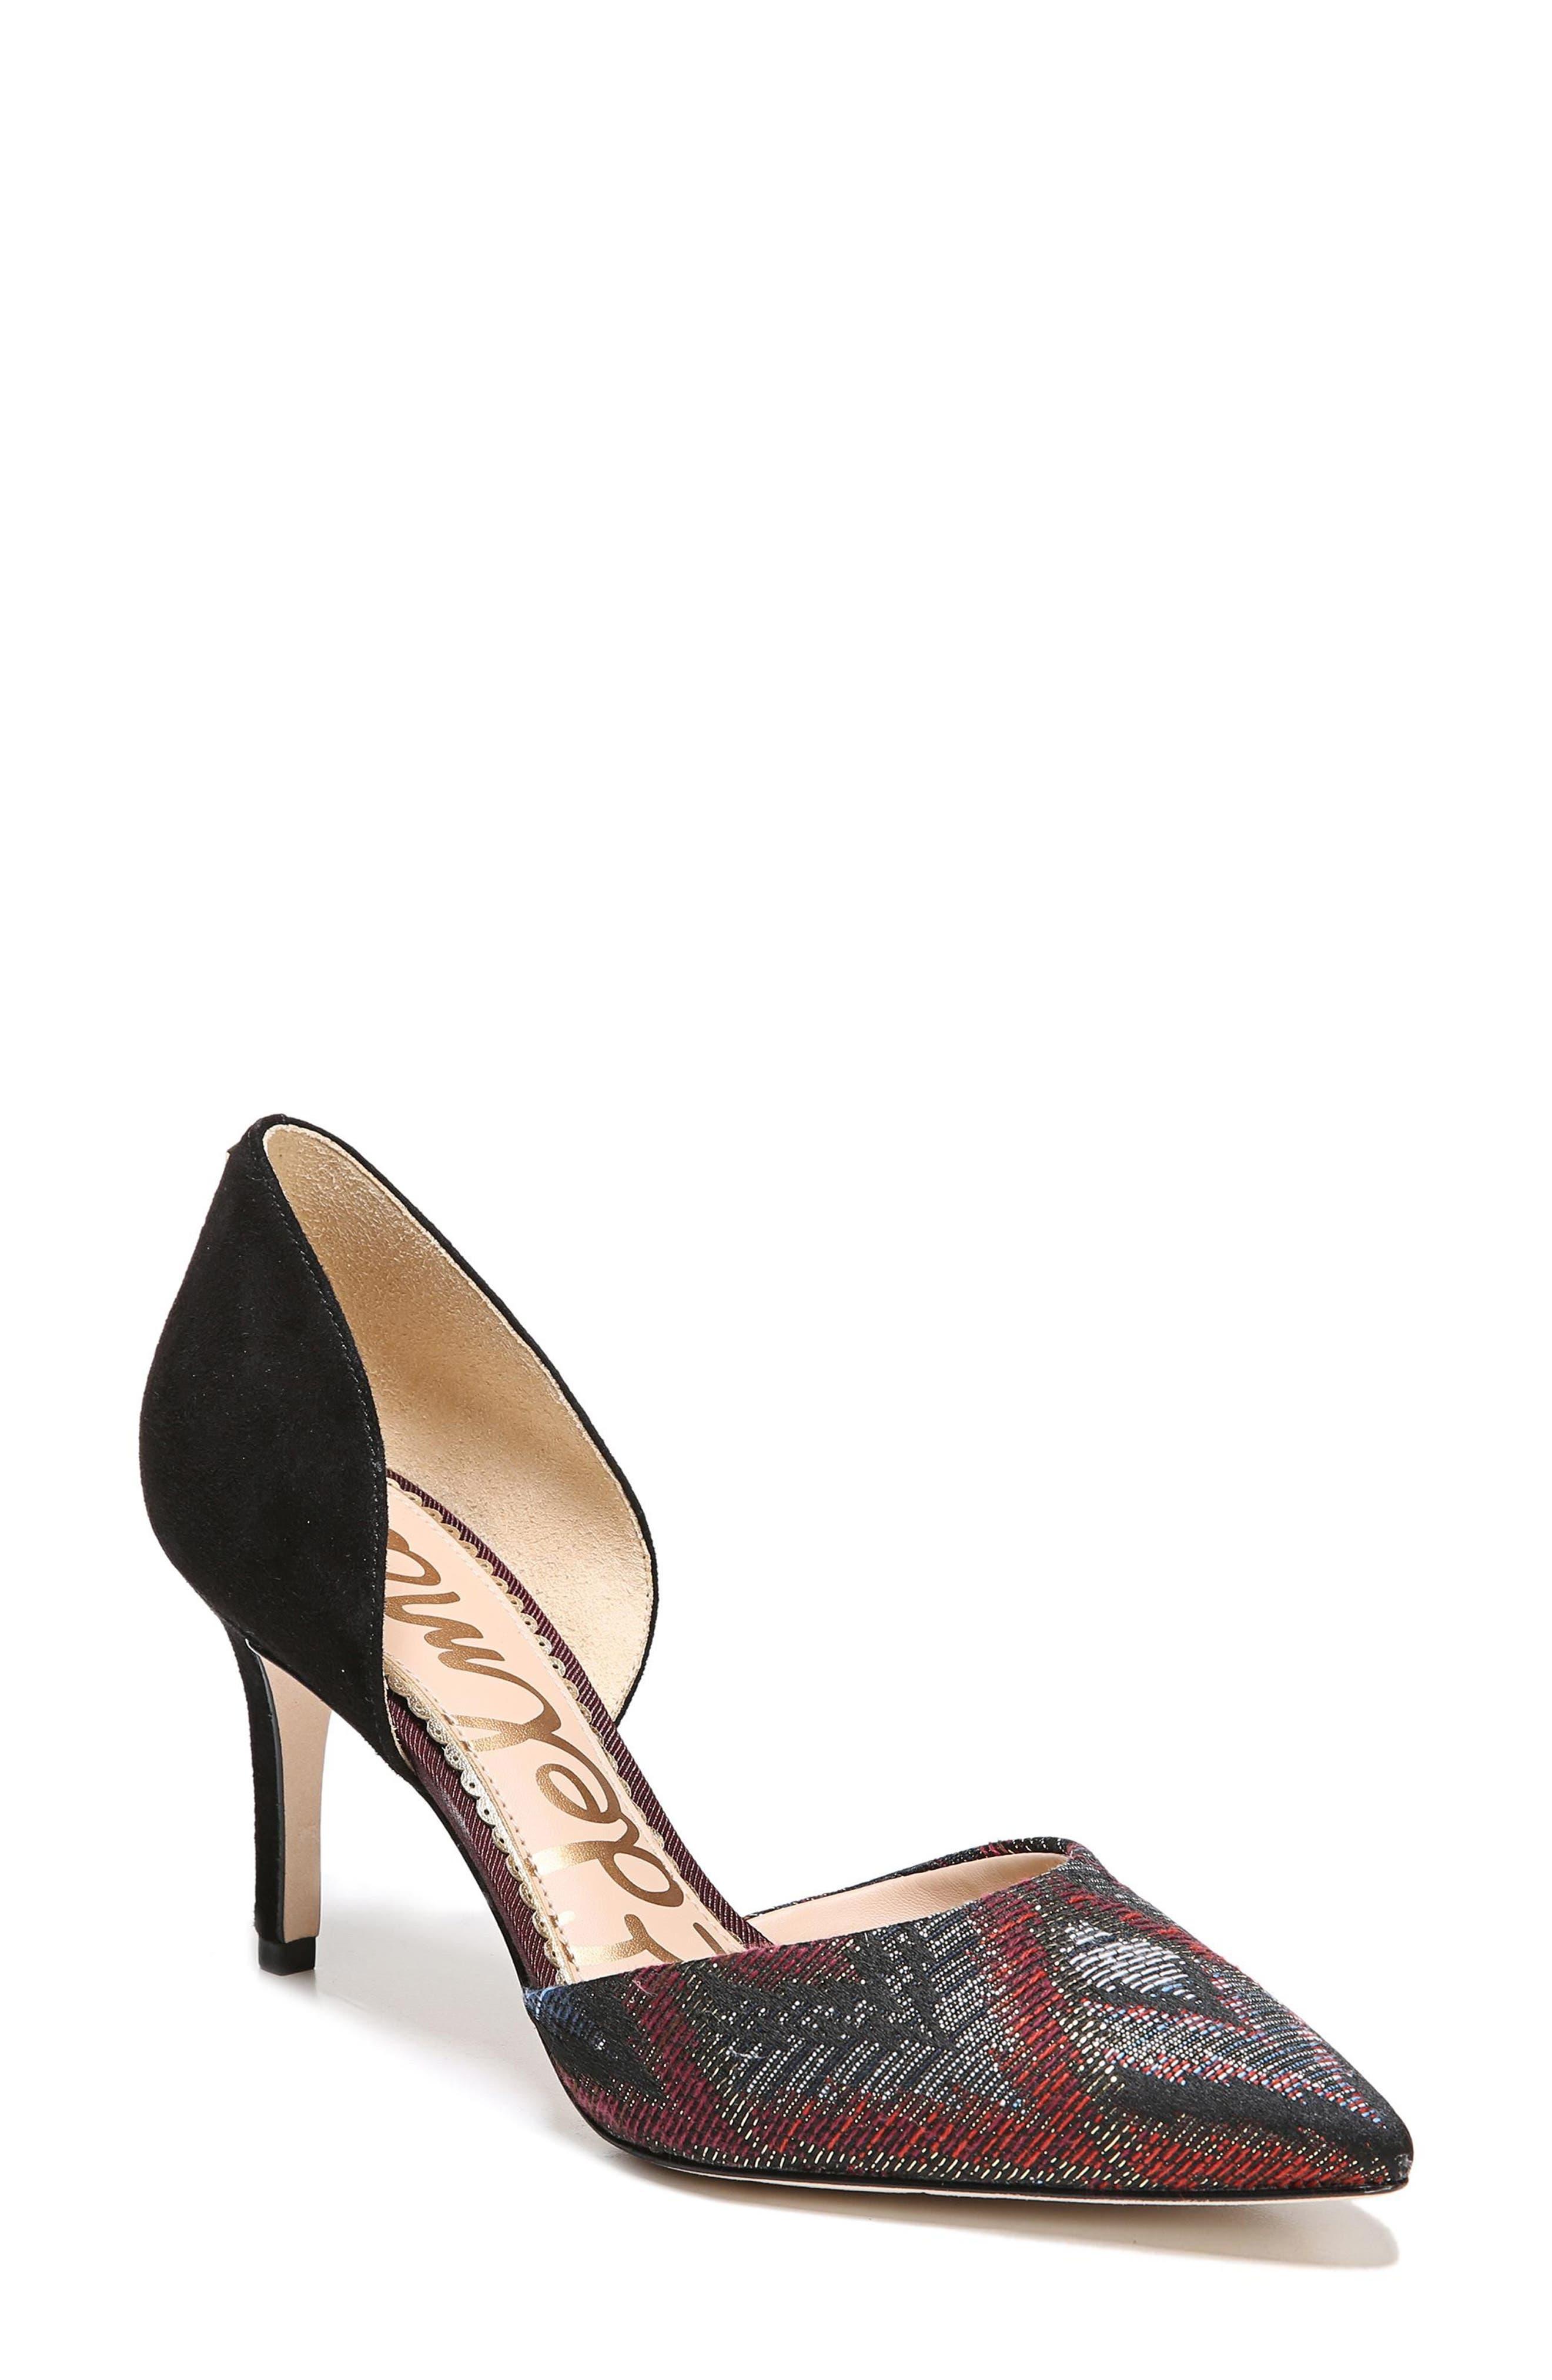 Alternate Image 1 Selected - Sam Edelman 'Telsa' d'Orsay Pointy Toe Pump (Women)